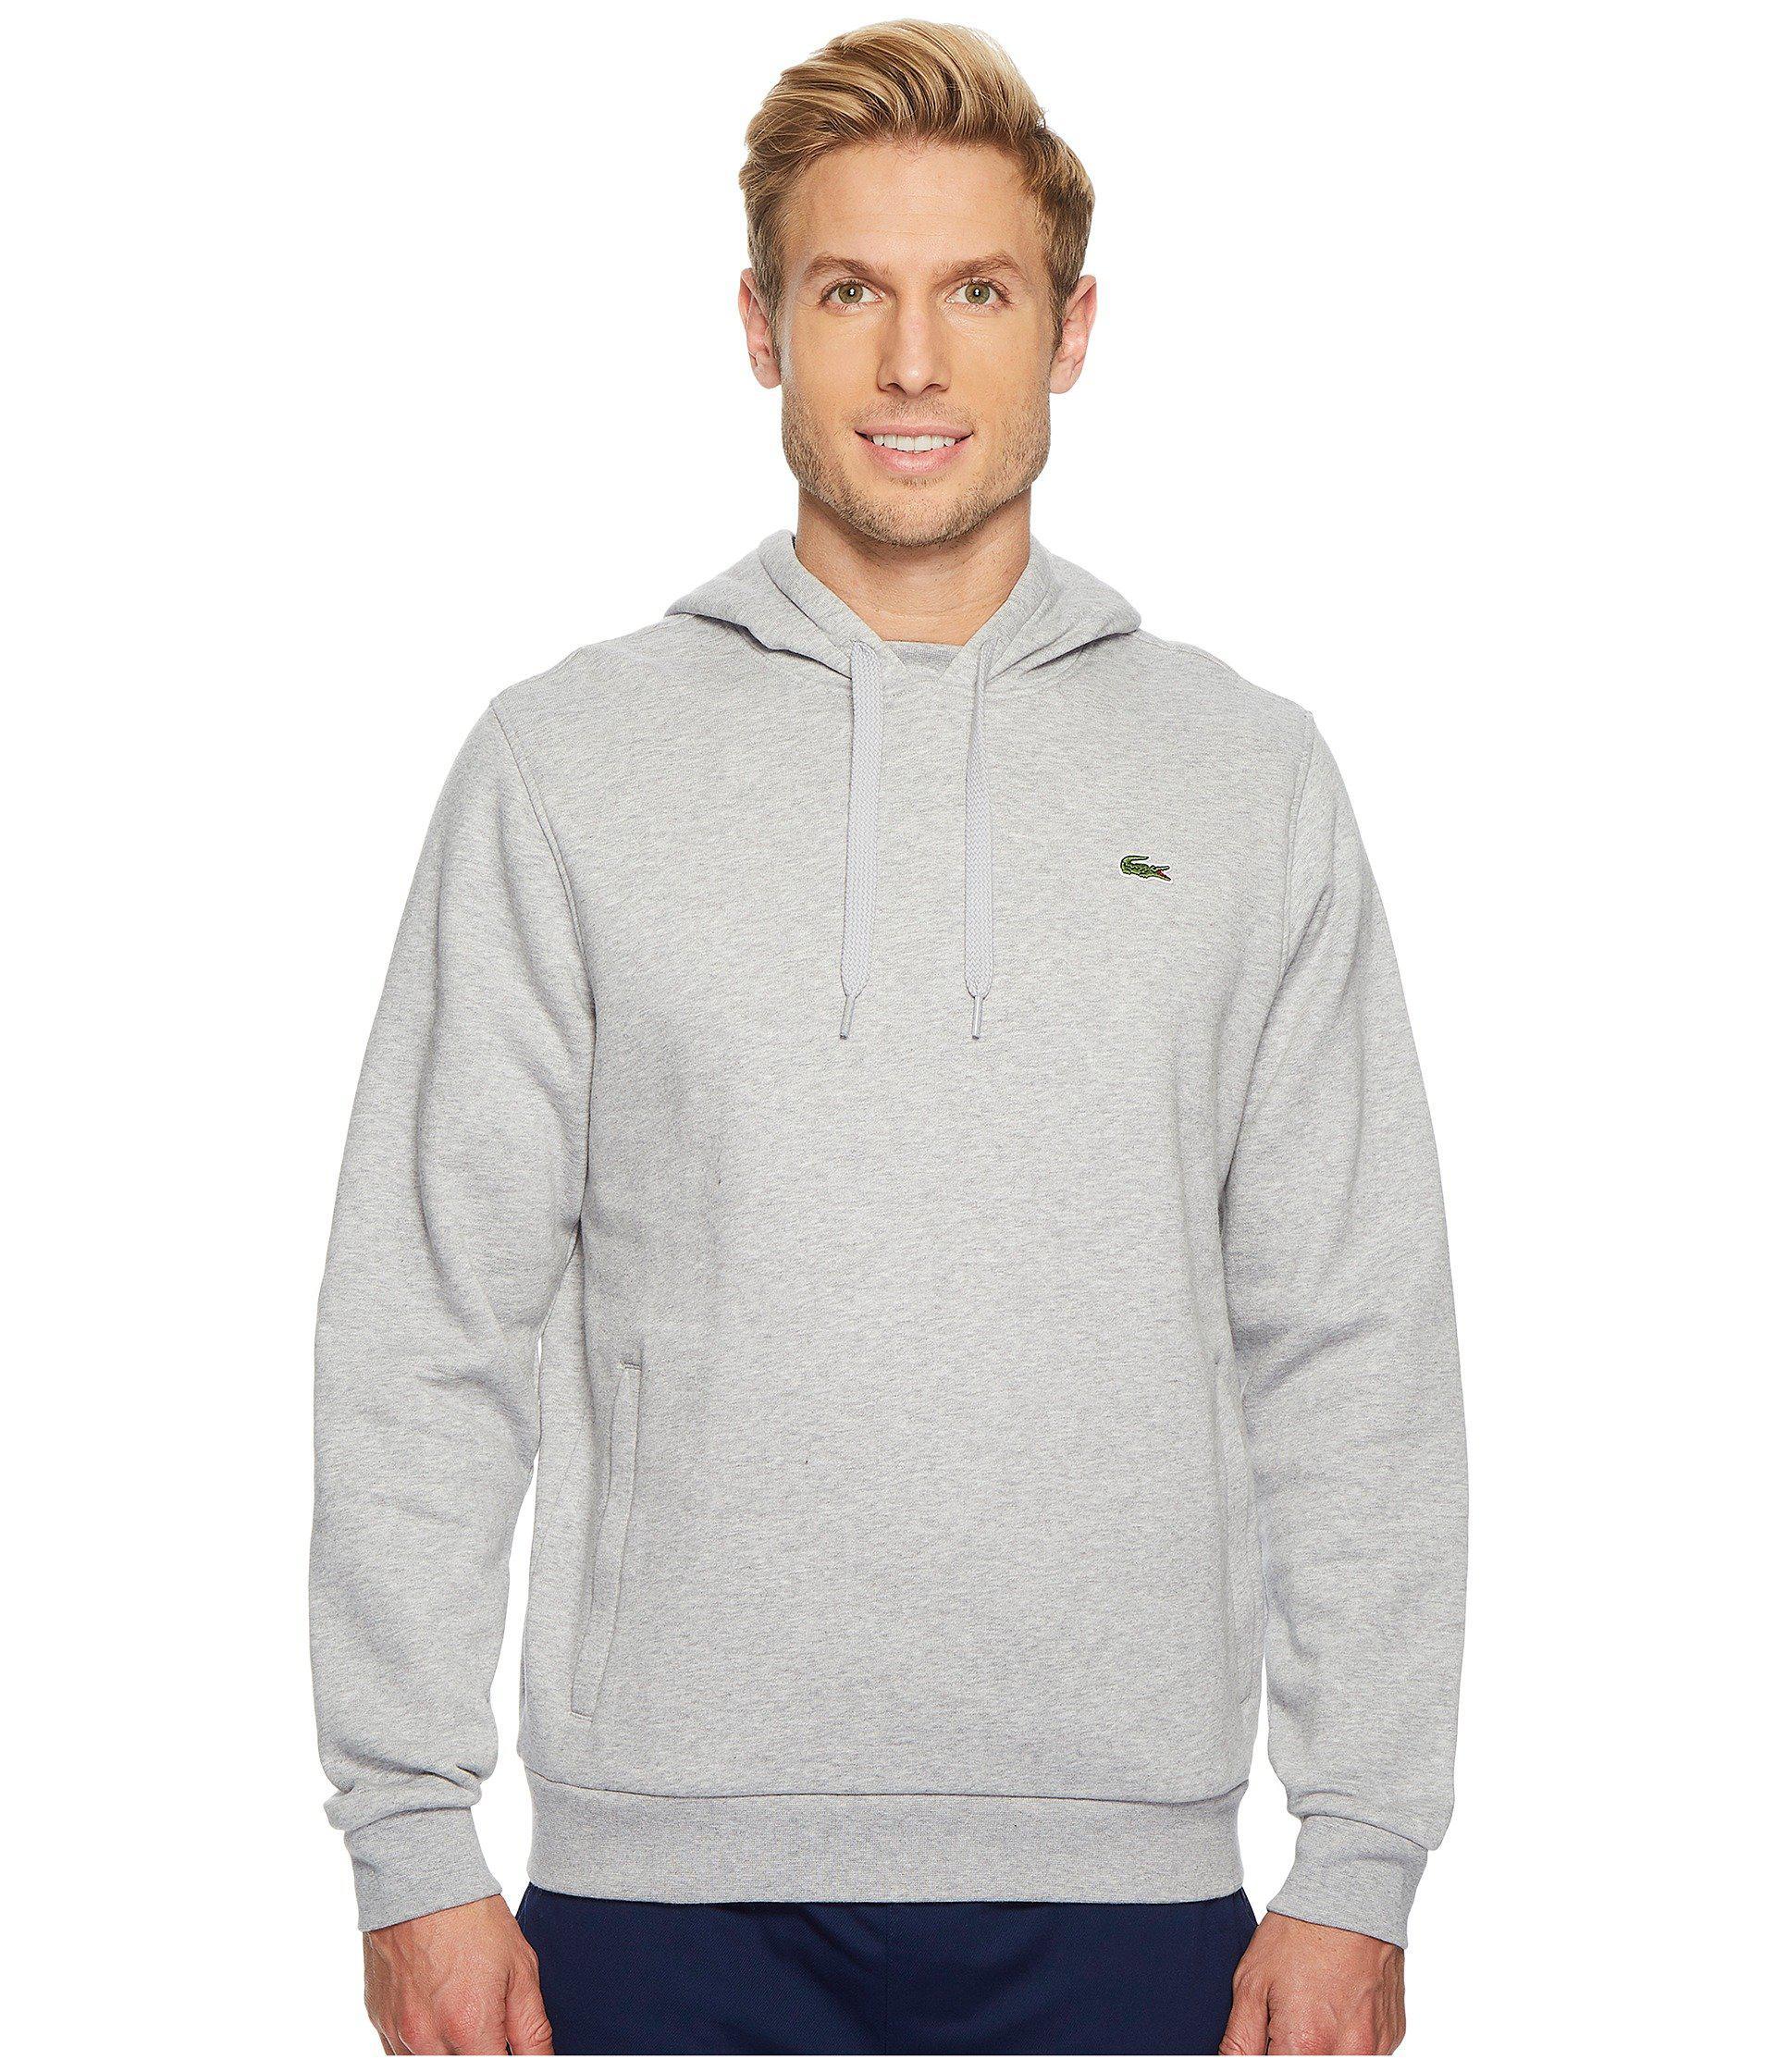 cdfecead5b Sport Pullover Hoodie Fleece (silver Chine/navy Blue) Men's Sweatshirt